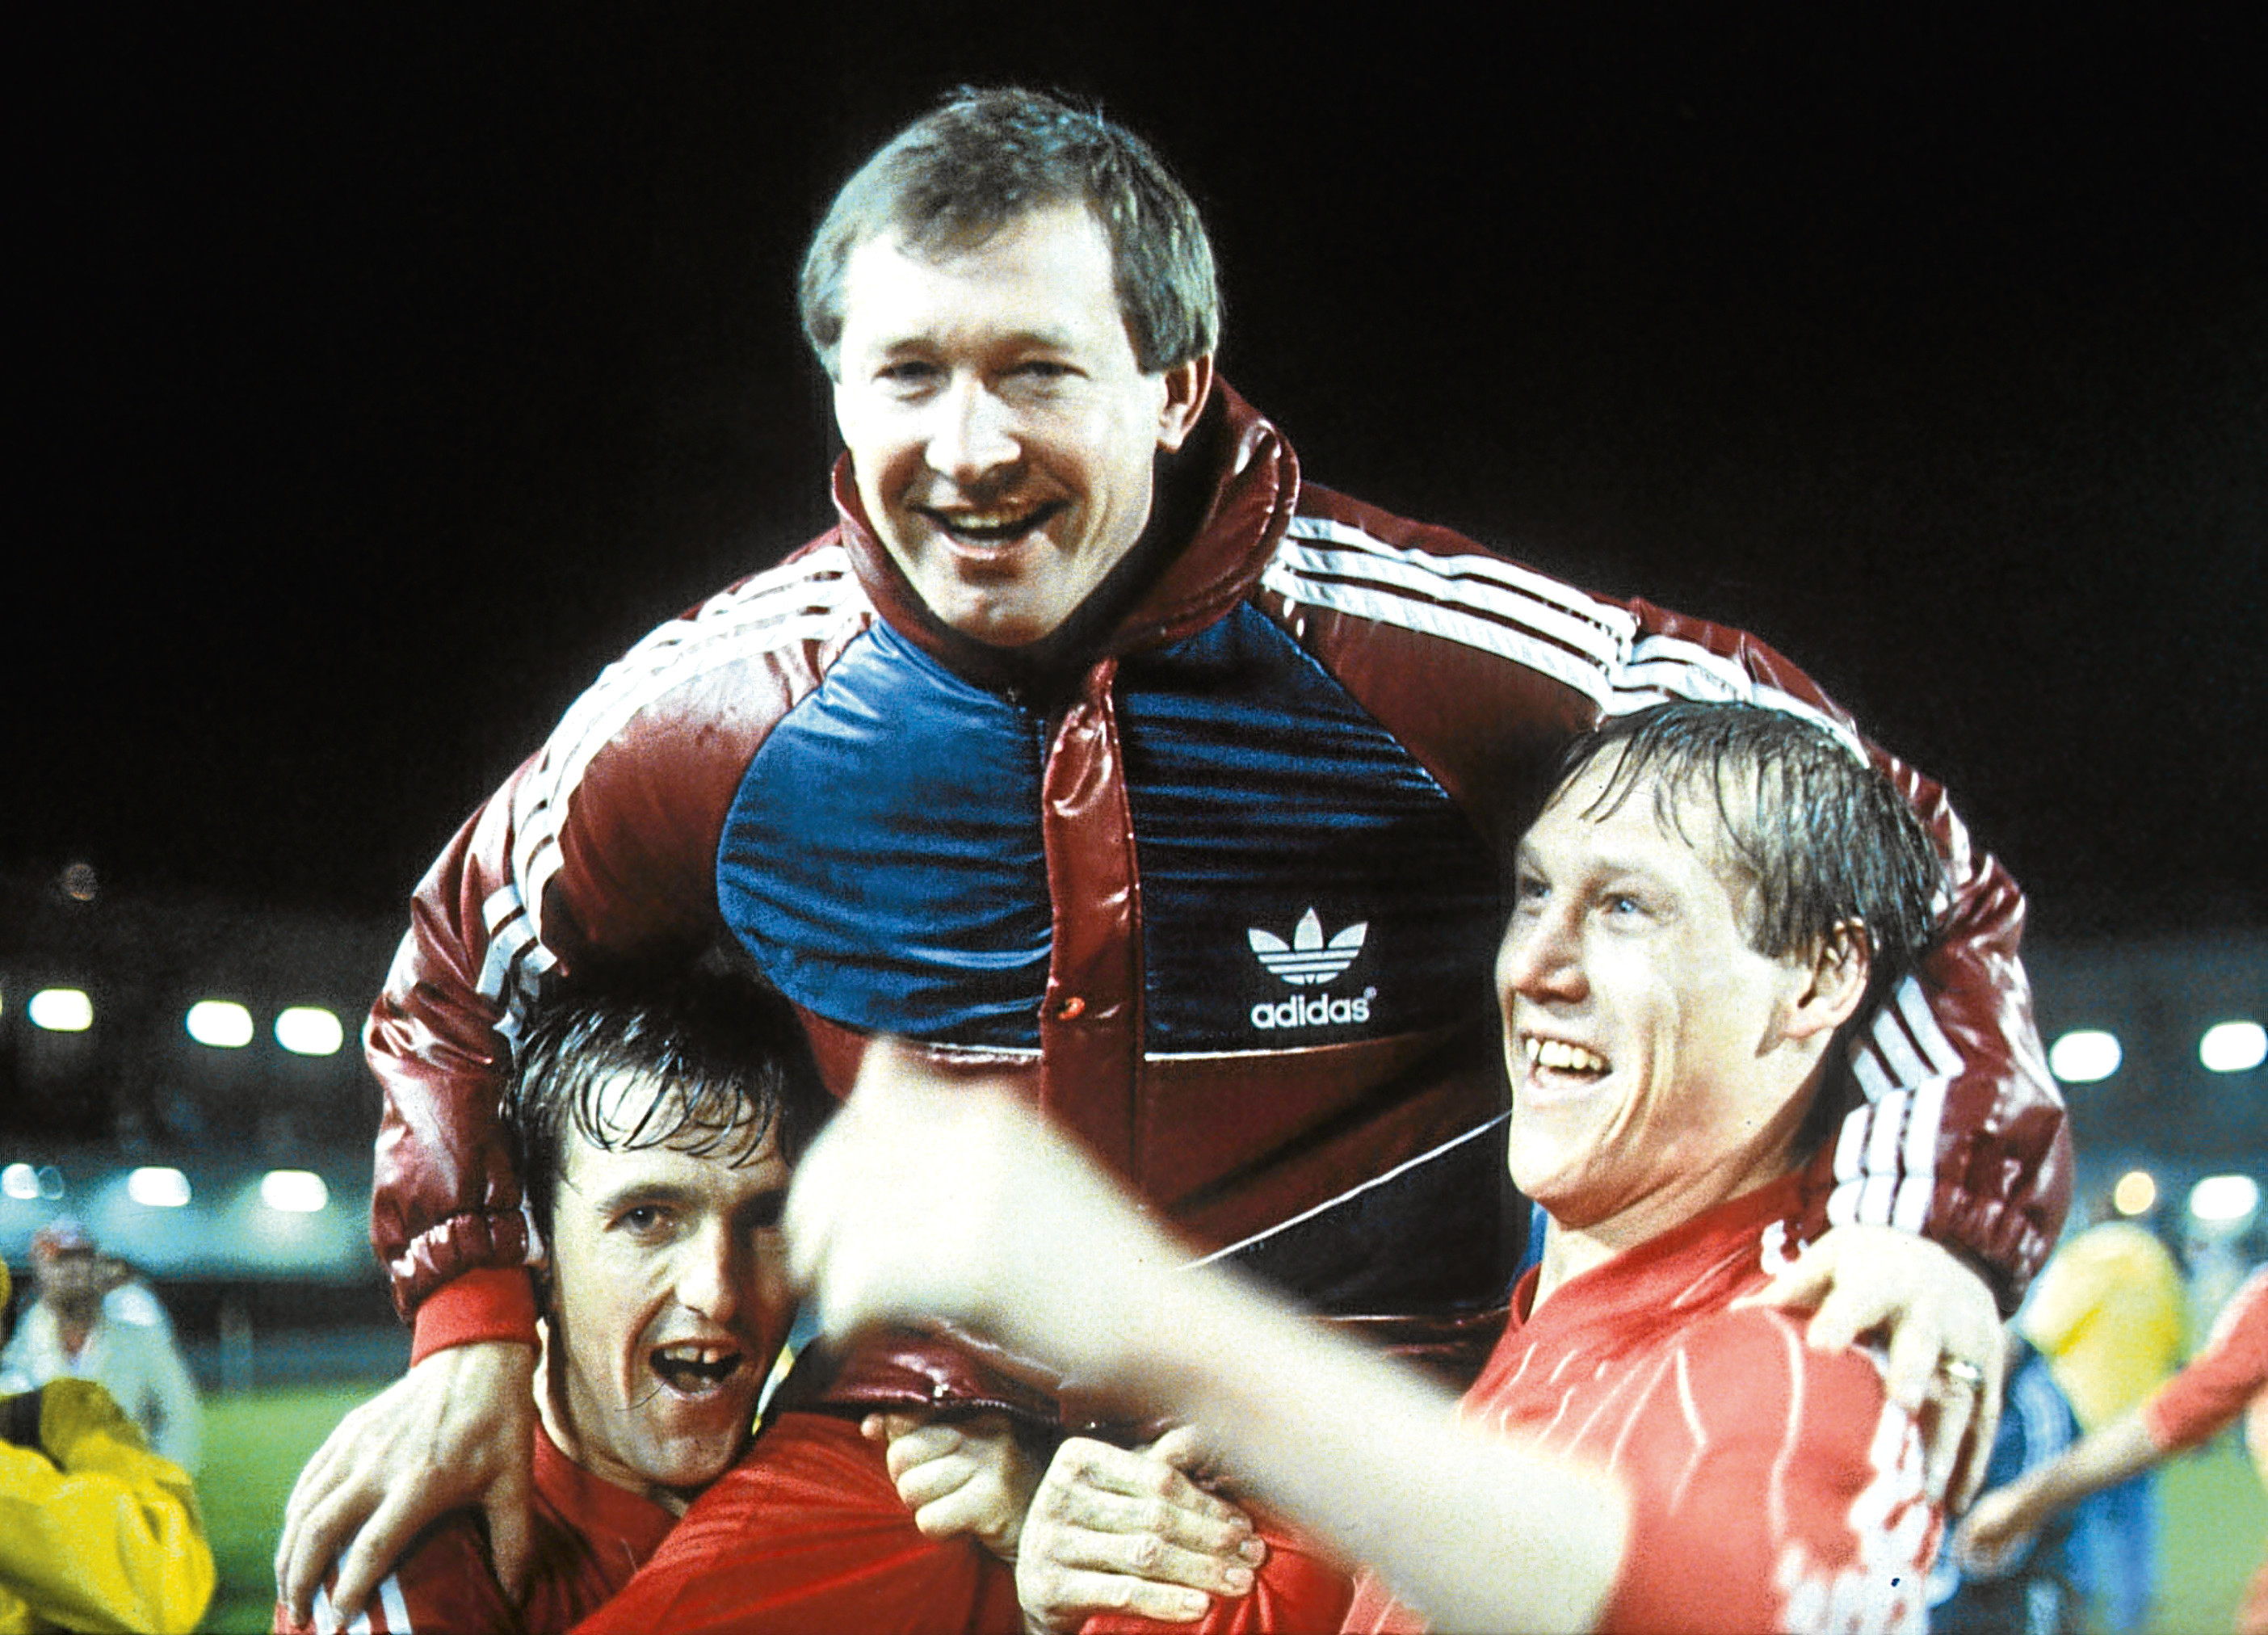 Alex Ferguson in his Dons glory days in Gothenburg.